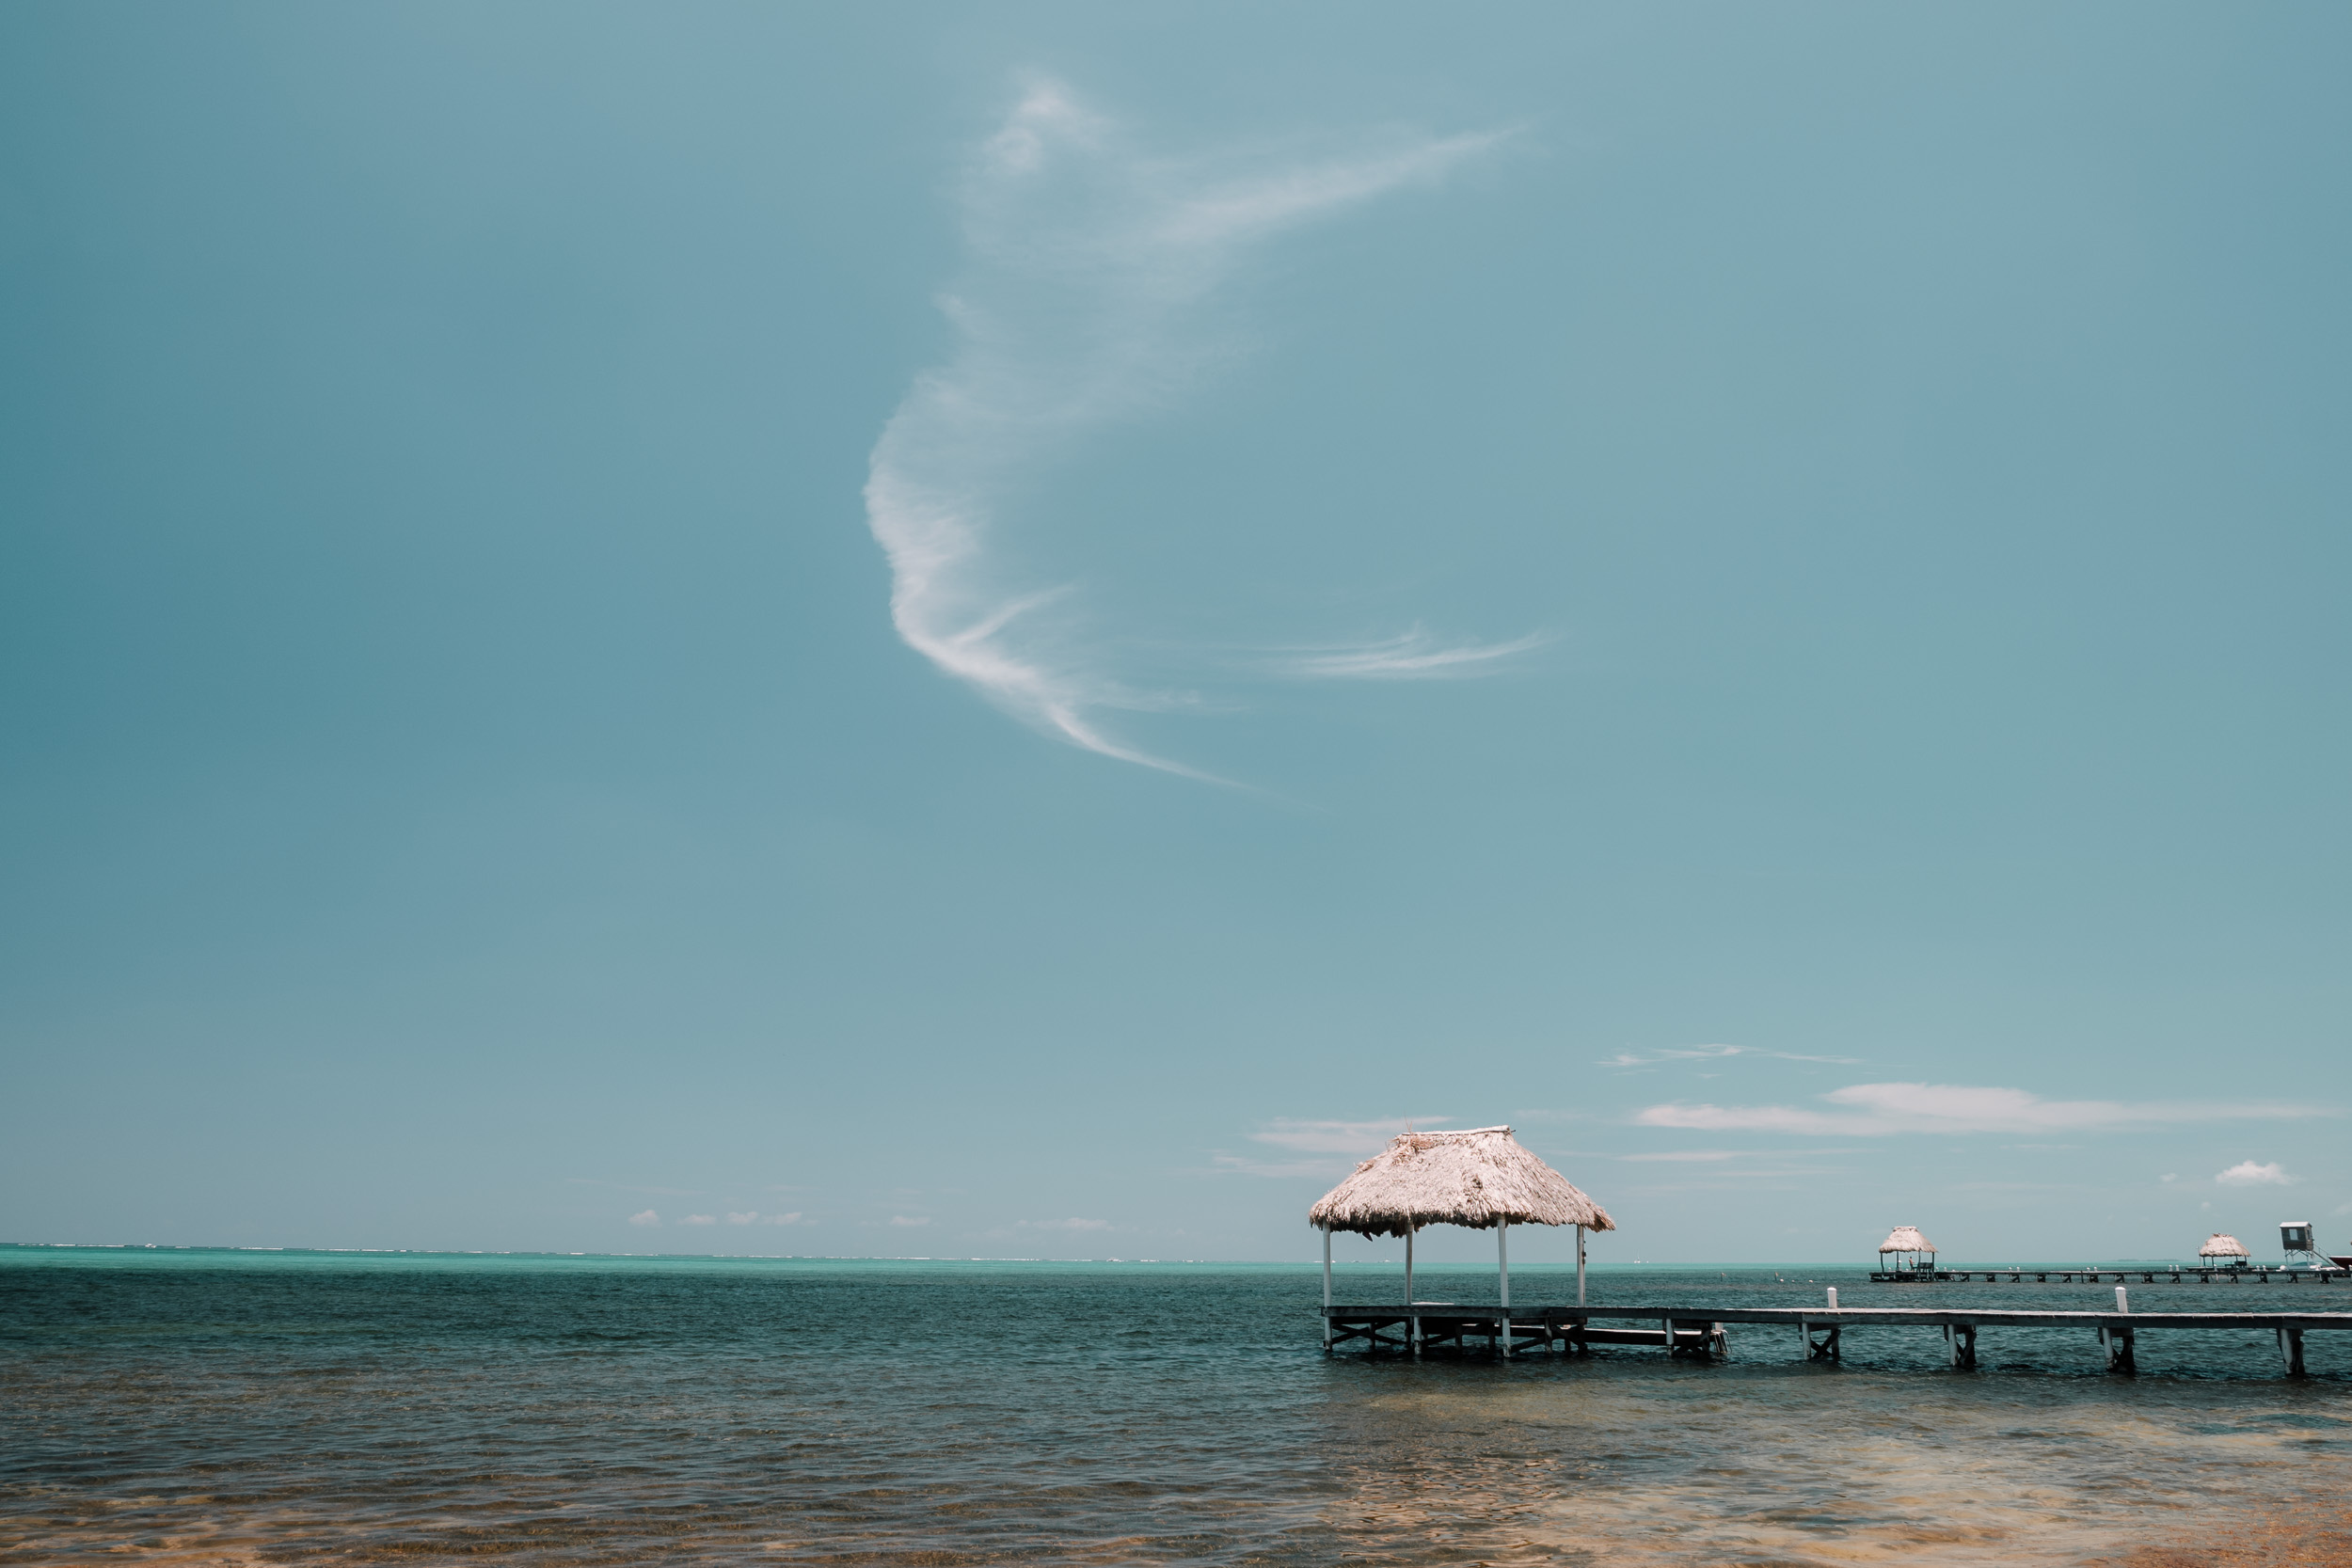 Pier on Caribbean